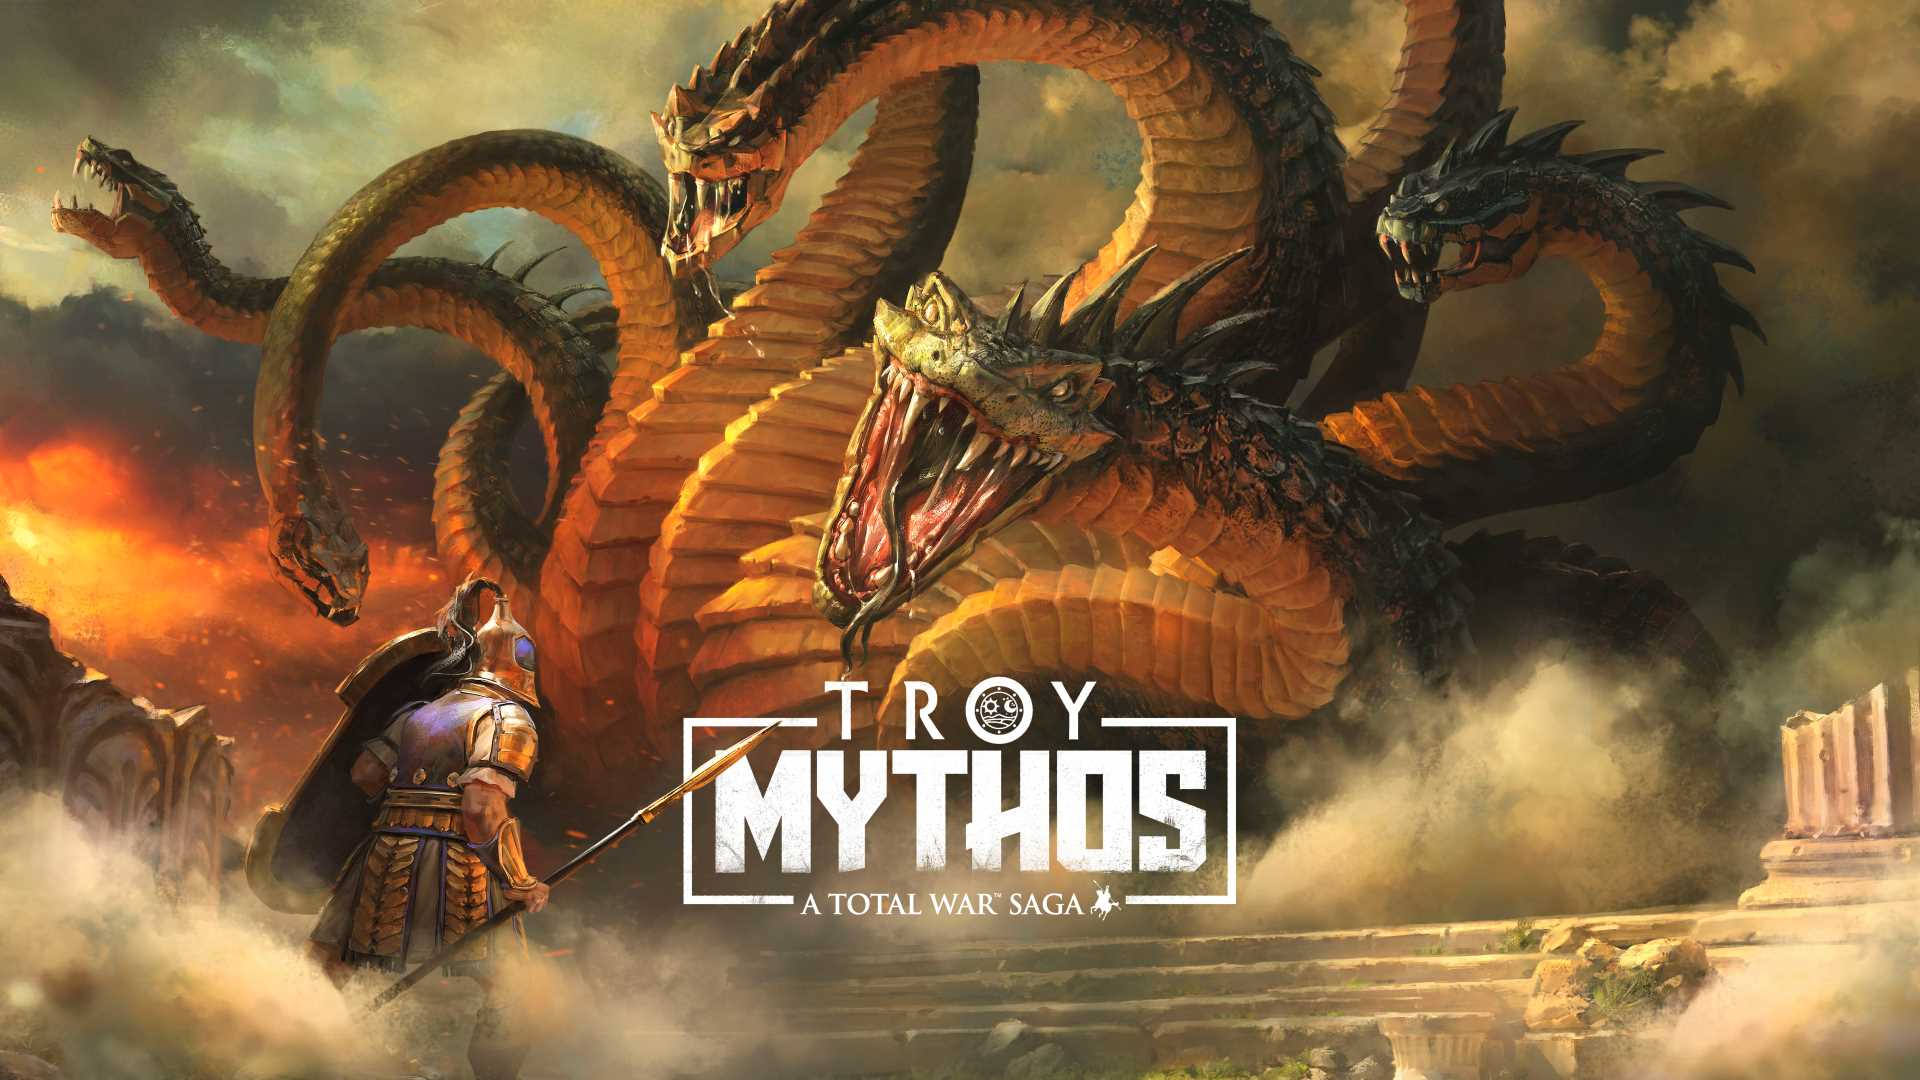 A Total War Saga: TROY Mythos - Key Art